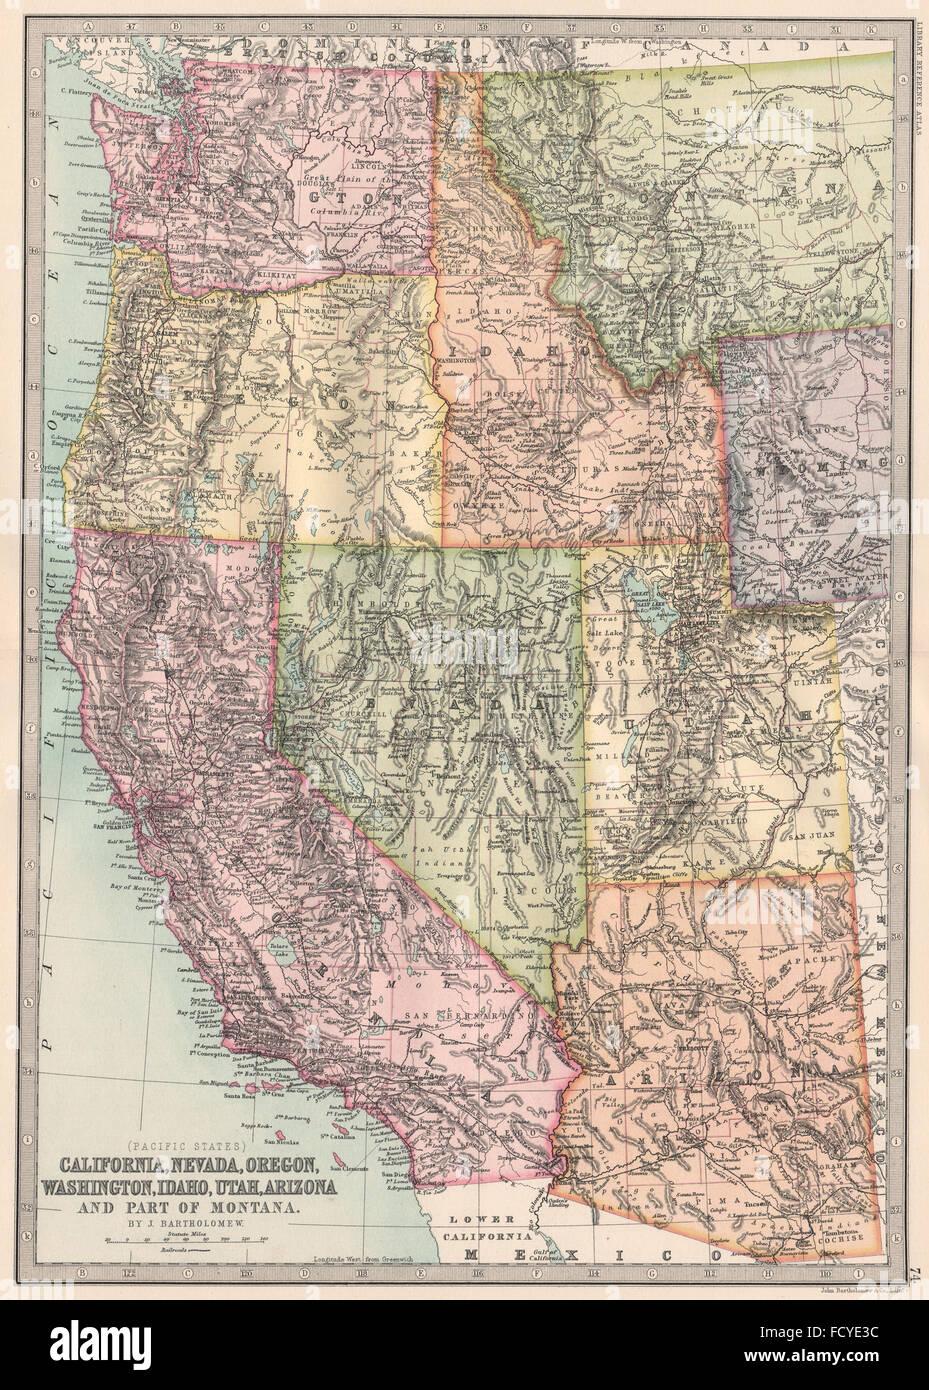 USA PACIFIC STATES:California Nevada Oregon Washington Idaho UT ...